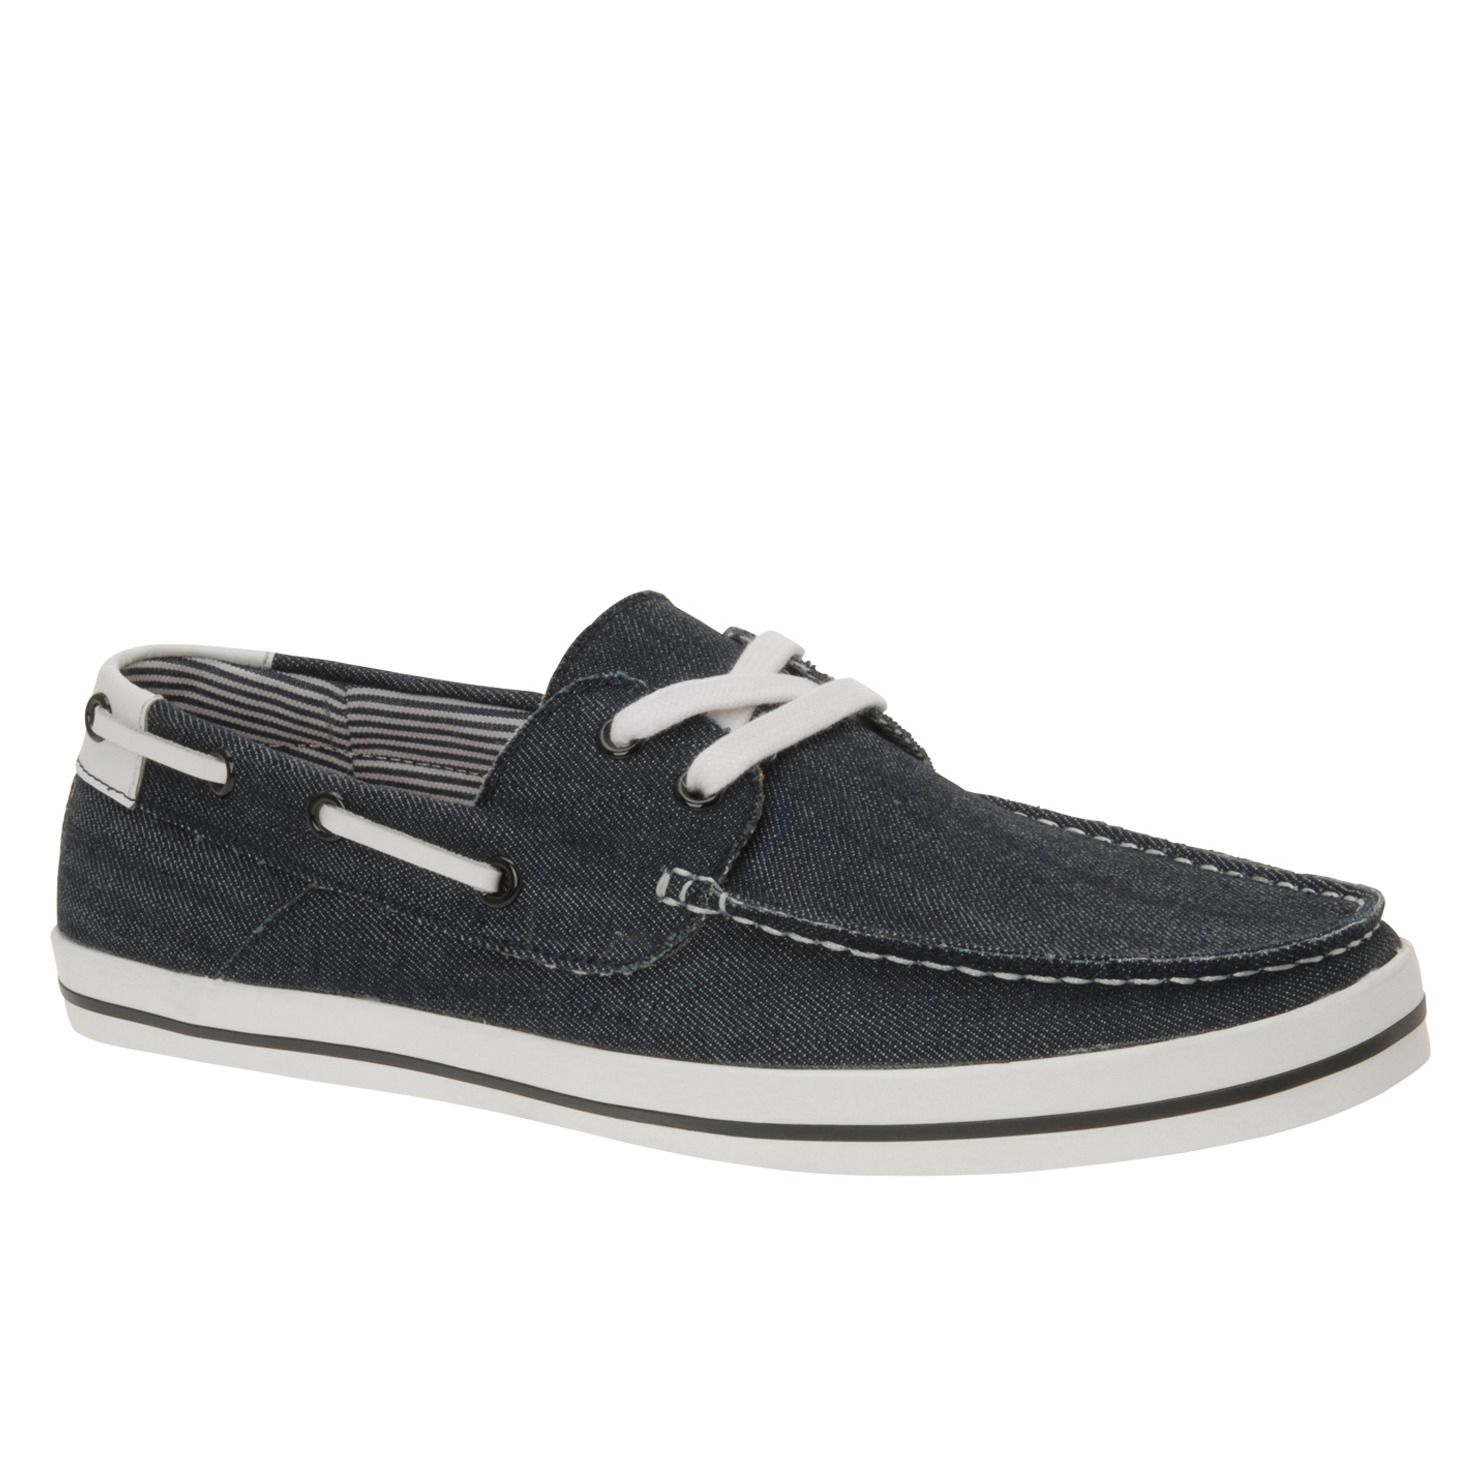 d8e18712c3d7 BROCKWELL - men s sneakers shoes for sale at ALDO Shoes. -  34.99 ...